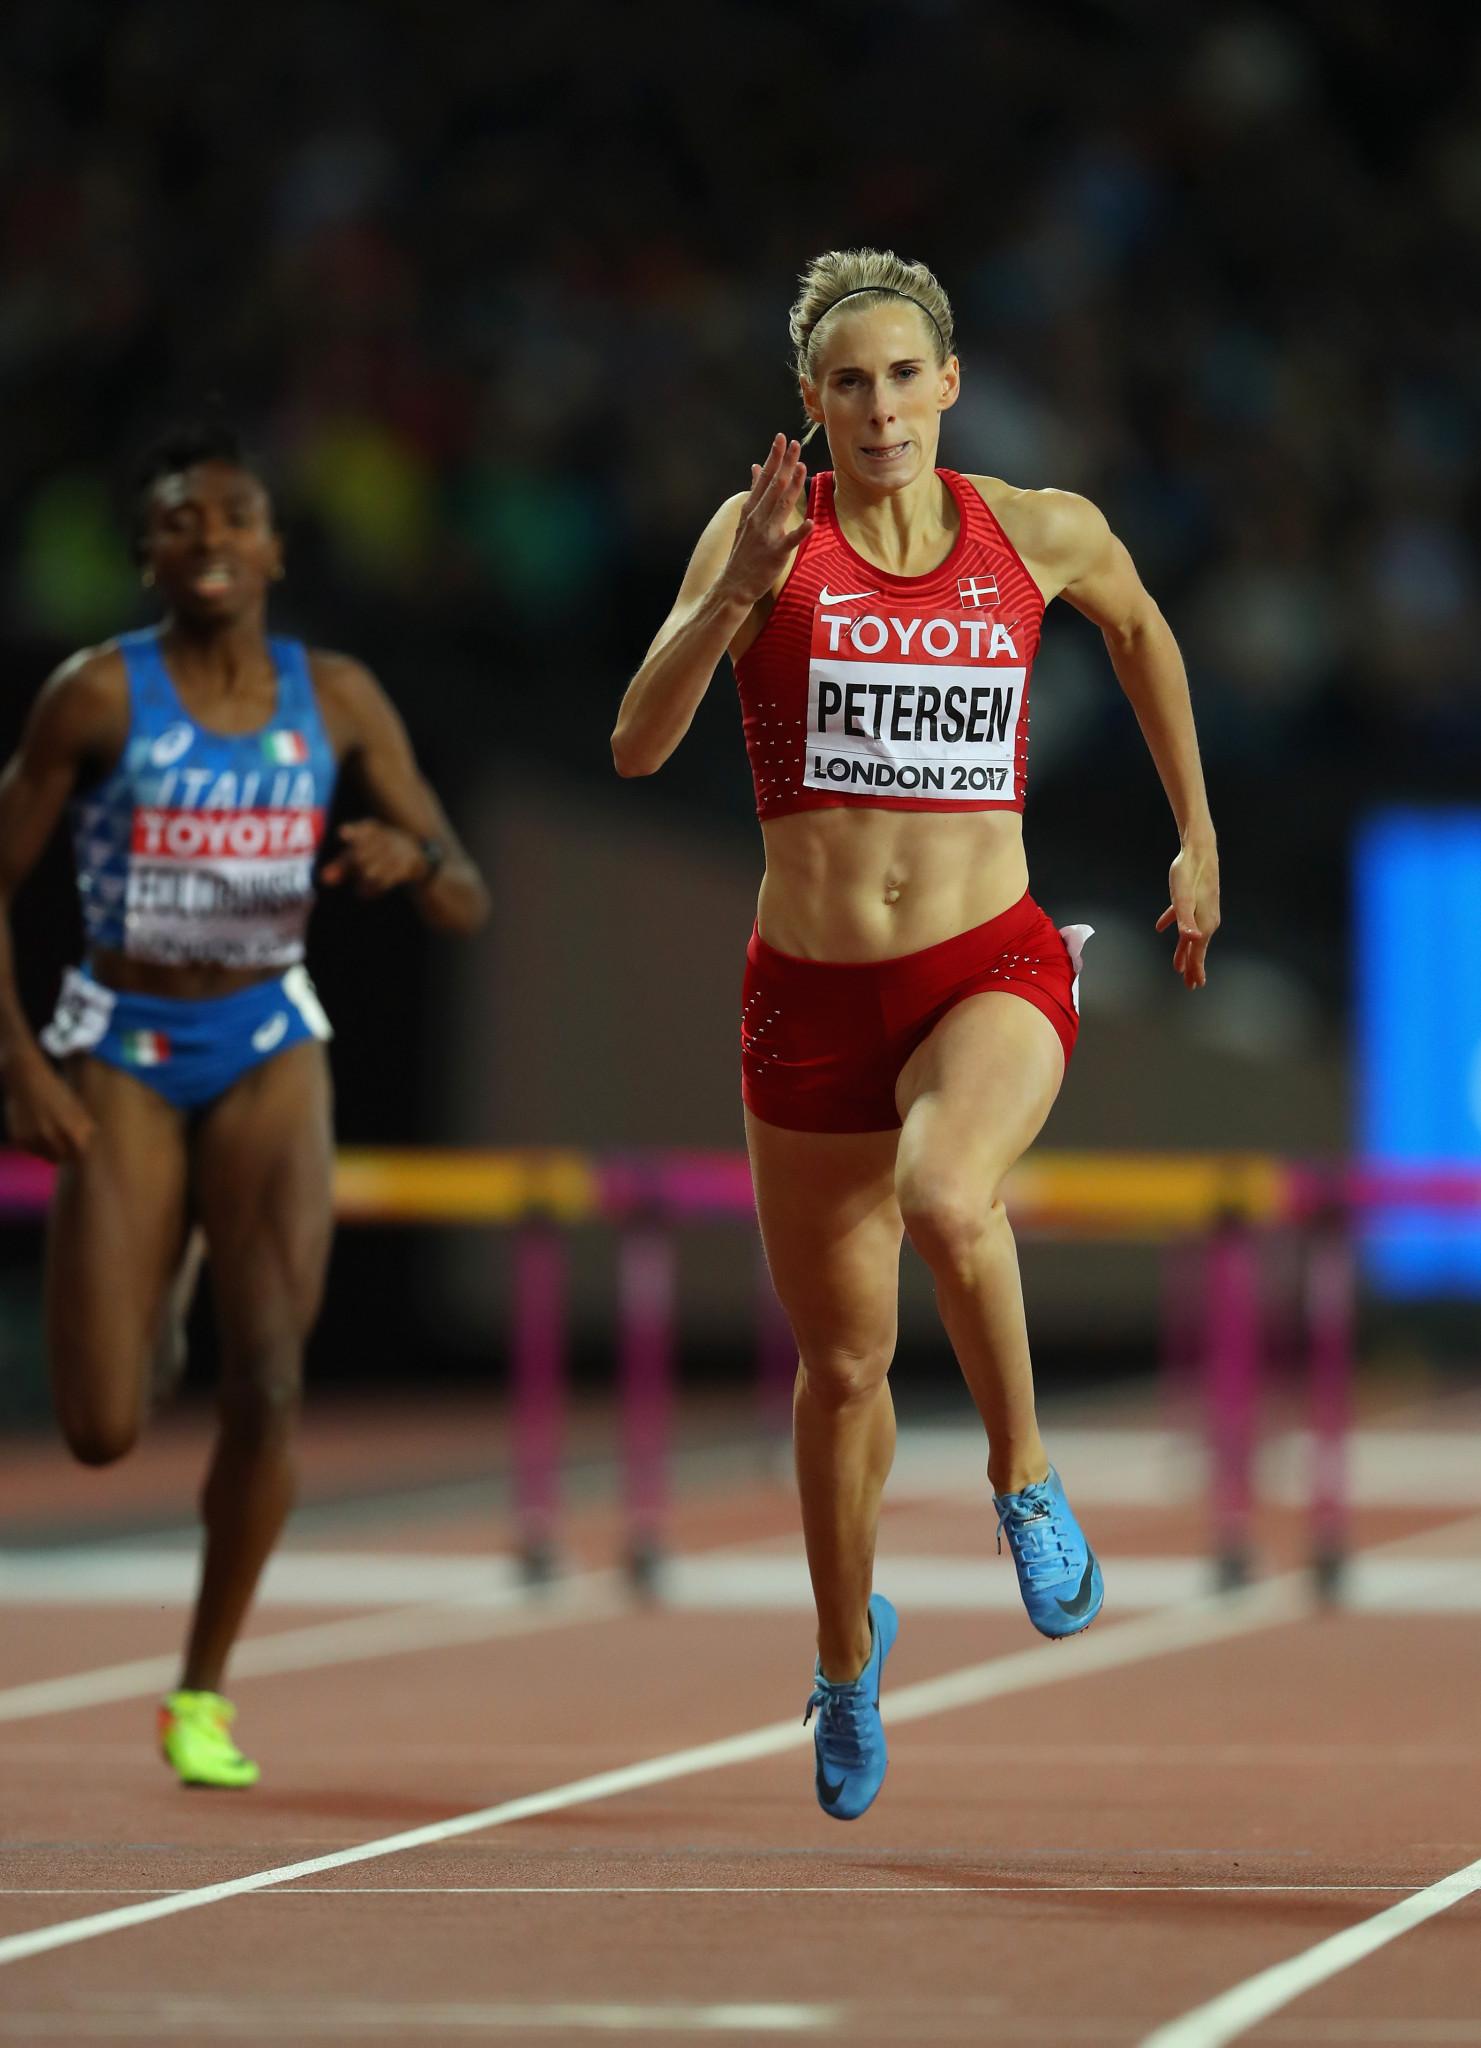 Olympic 400m hurdles silver medallist Sara Slott Petersen ©Getty Images